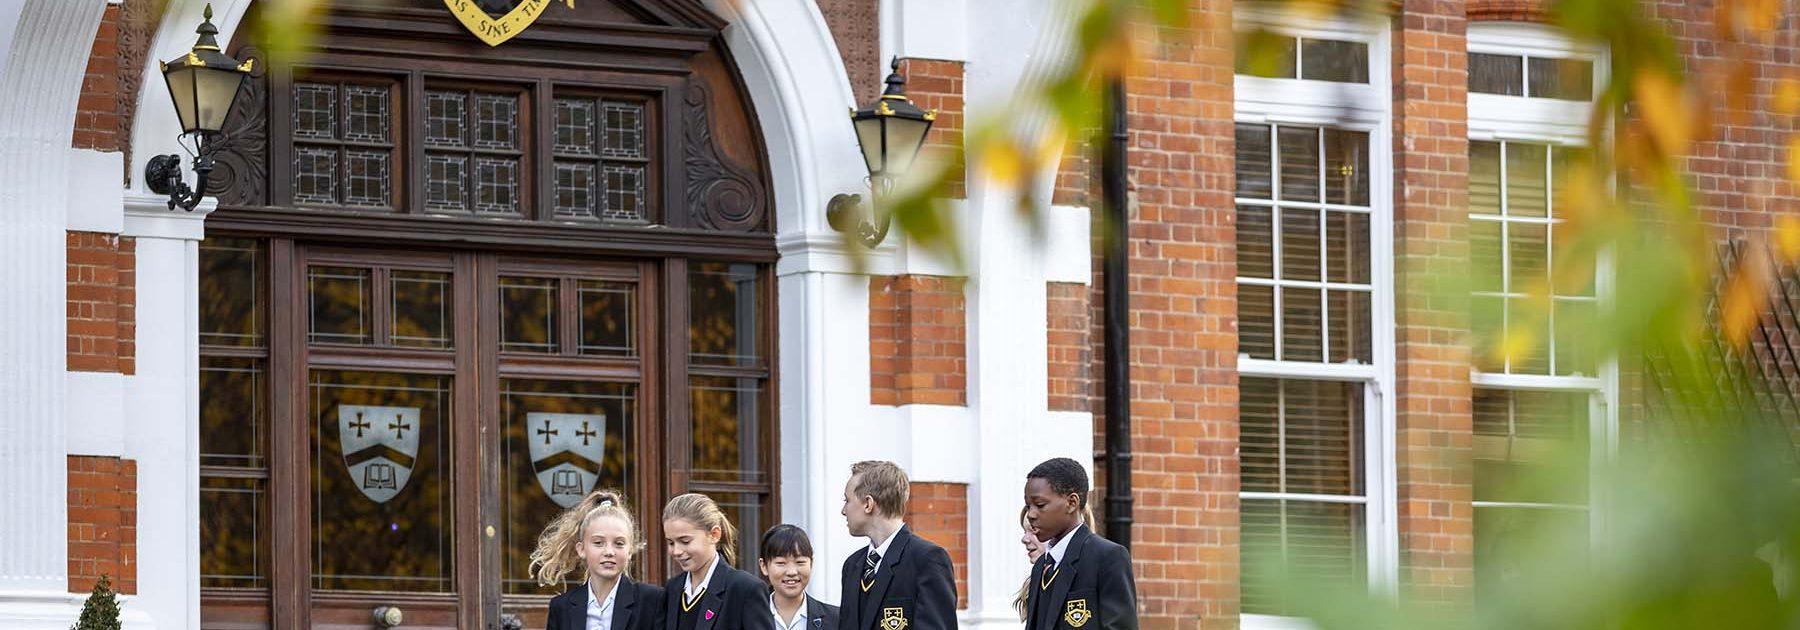 East Surrey Learning Partnership